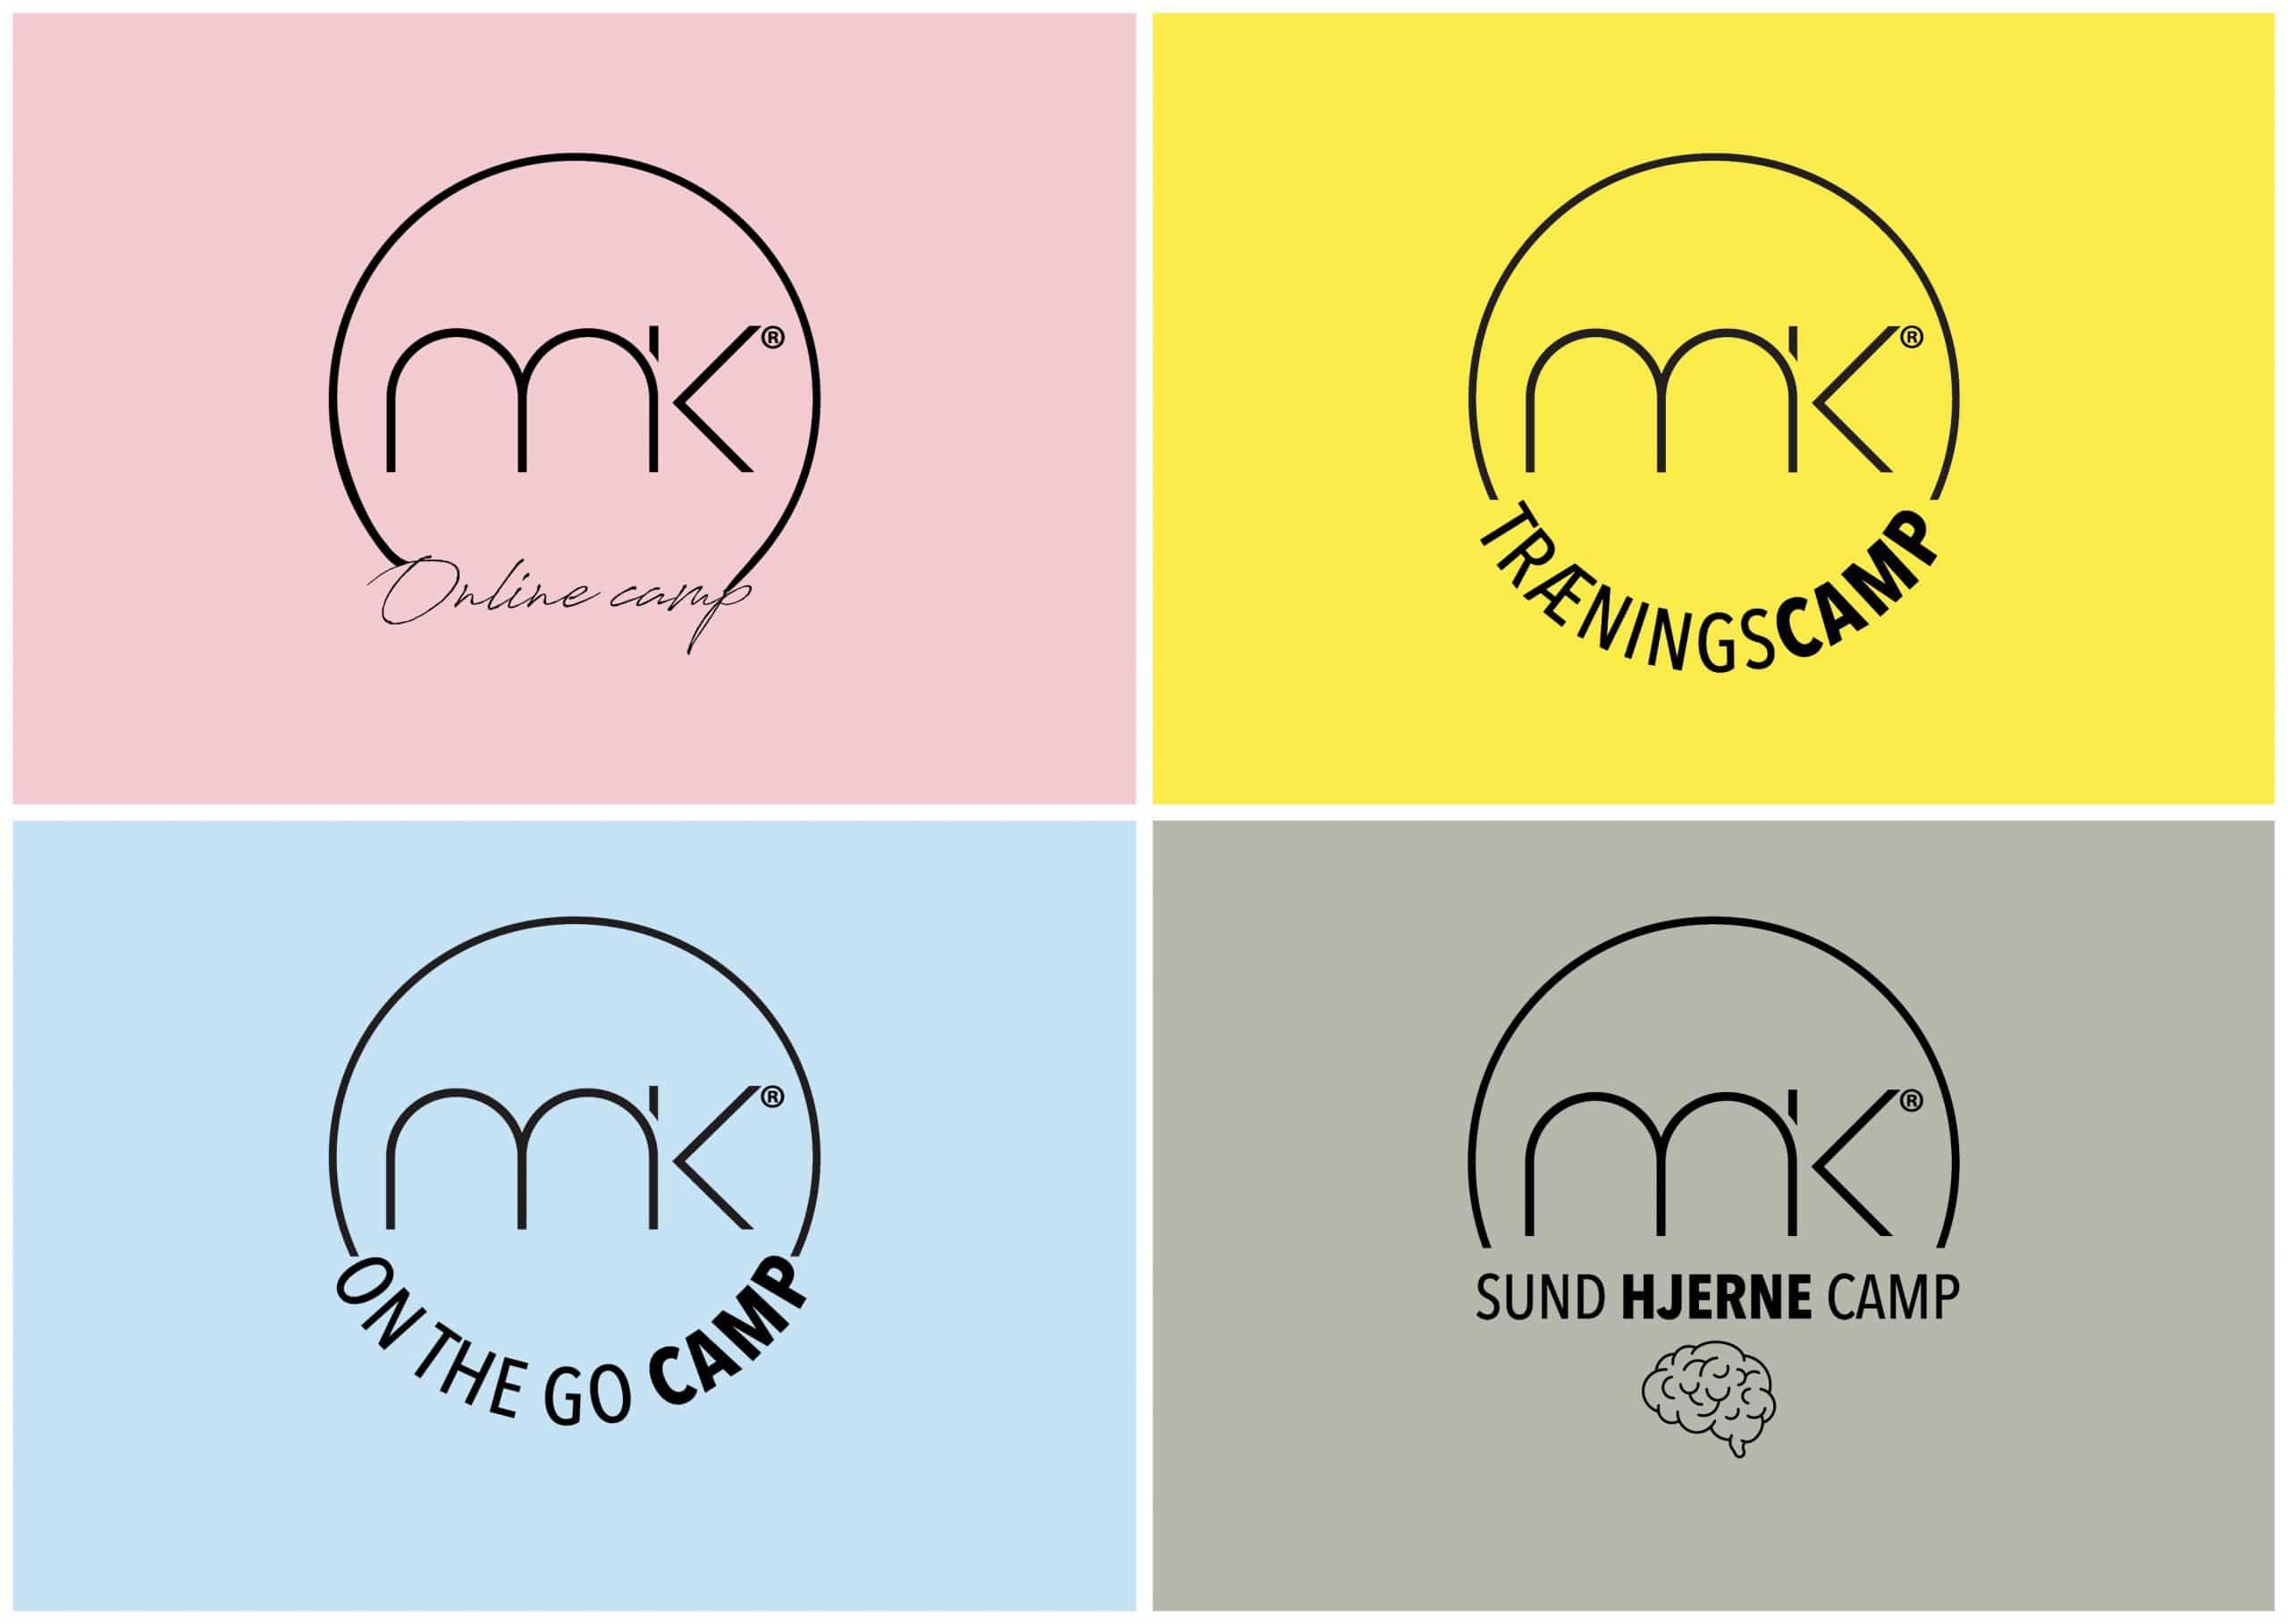 De fire MK camps